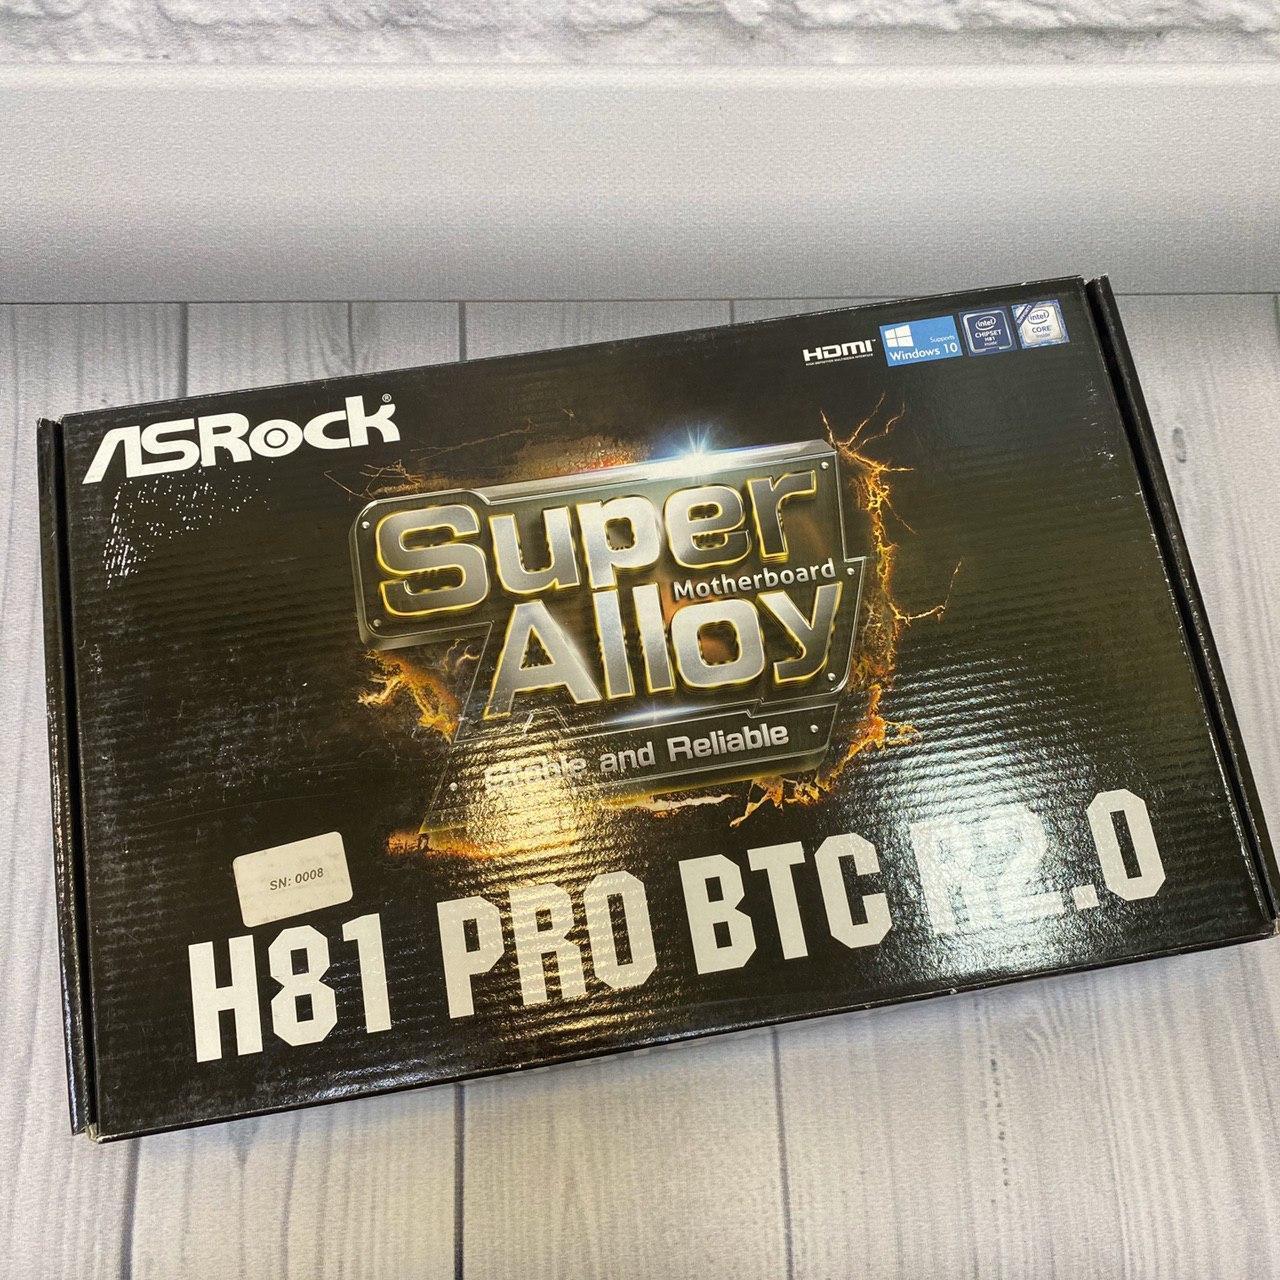 Материнская плата   (AsRock H 81 Pro BTS/s1150/ Intel H812 x DDR3/ATX)